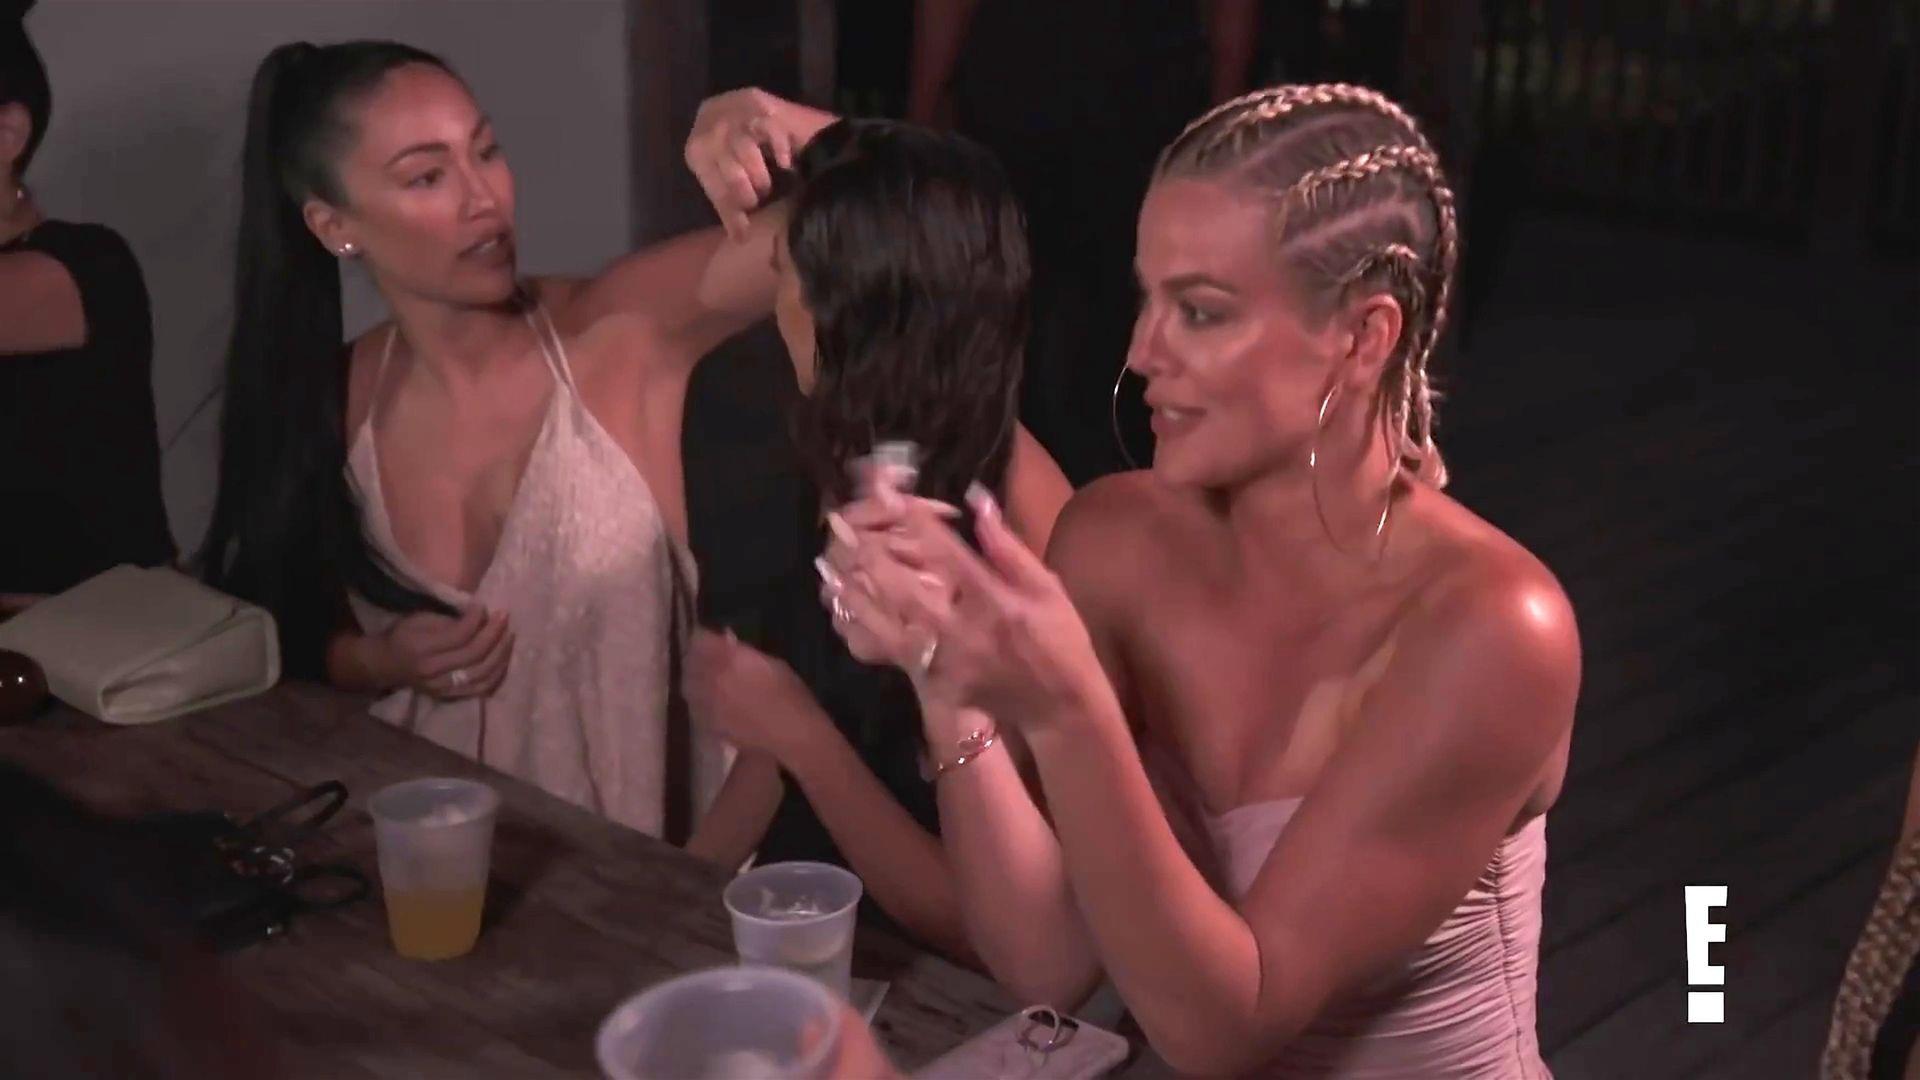 Khloé Kardashian Gets A Little Cold Without A Bra 0007